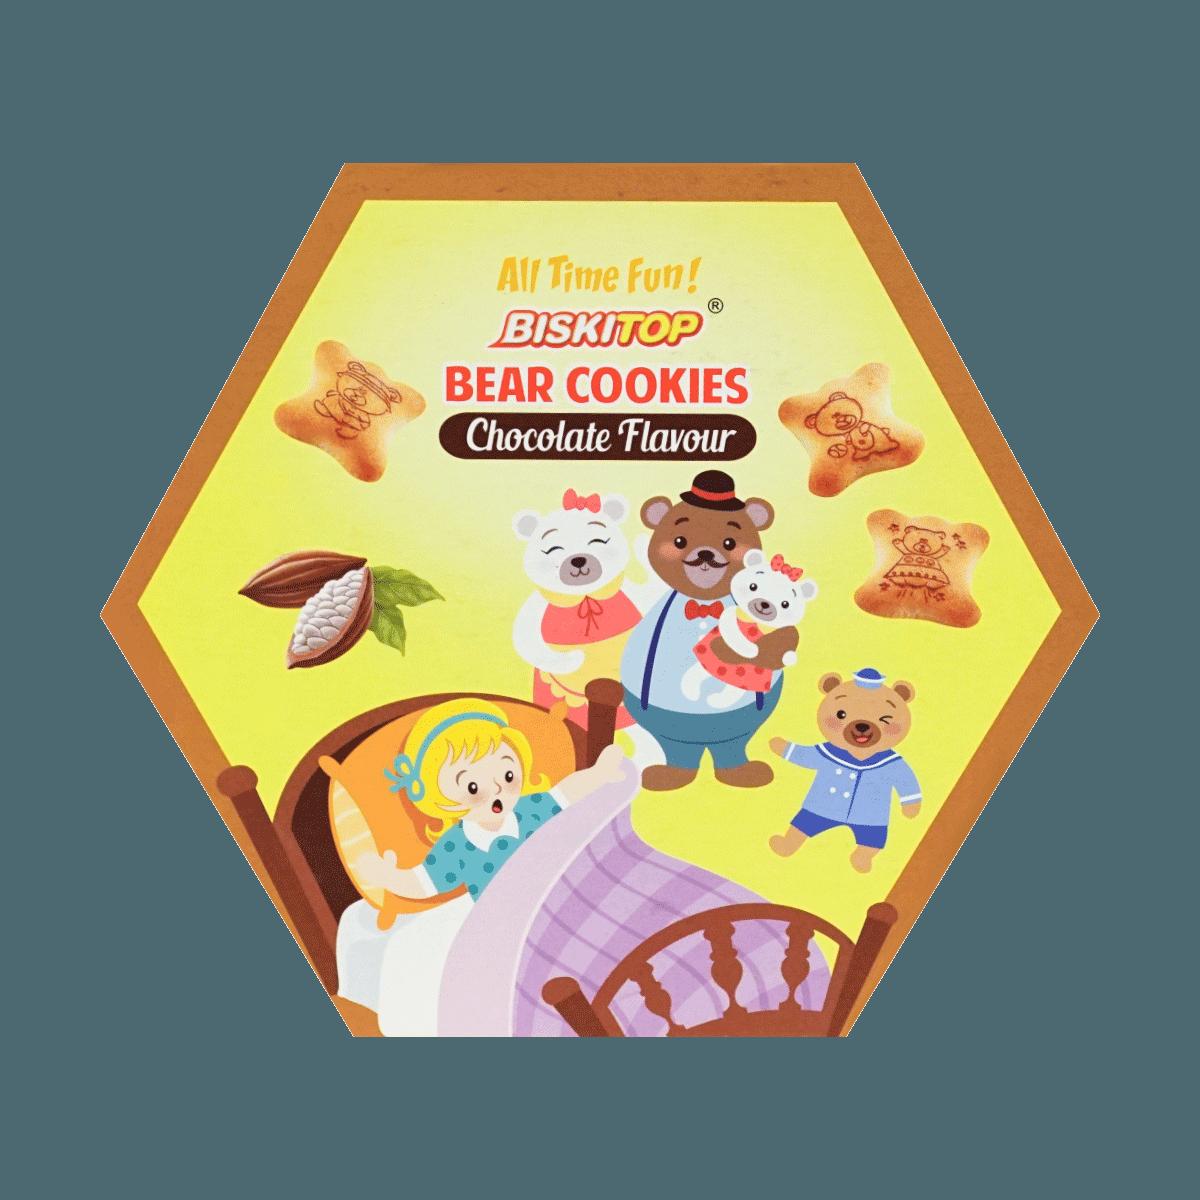 Yamibuy.com:Customer reviews:BISKITOP Cookies Chocolate Flavor 5pk